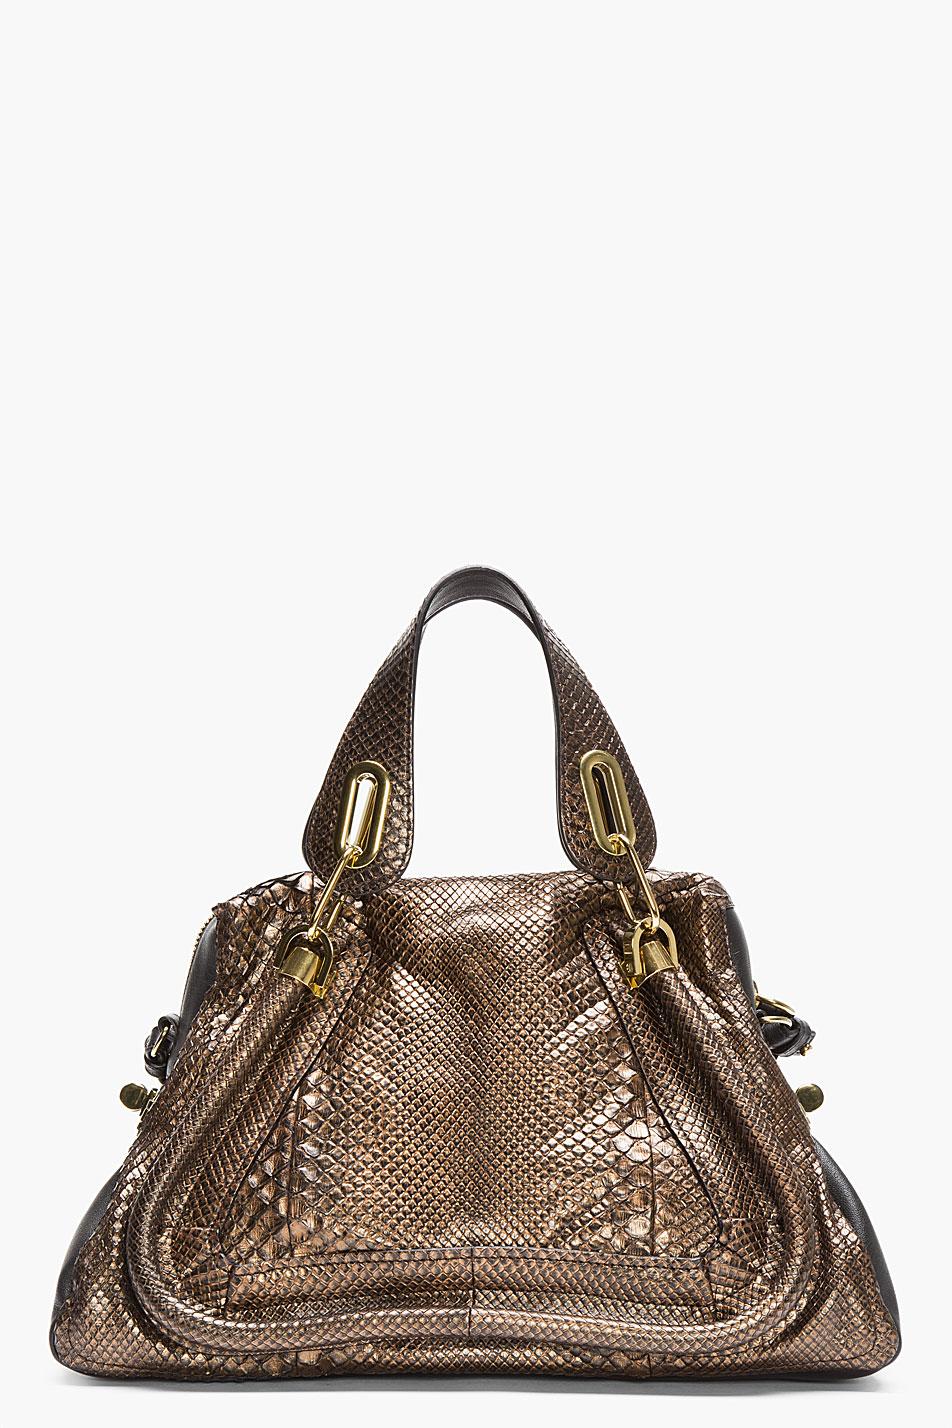 Chlo¨¦ Bronze Metallic Snakeskin Paraty Bag in Gold (bronze) | Lyst